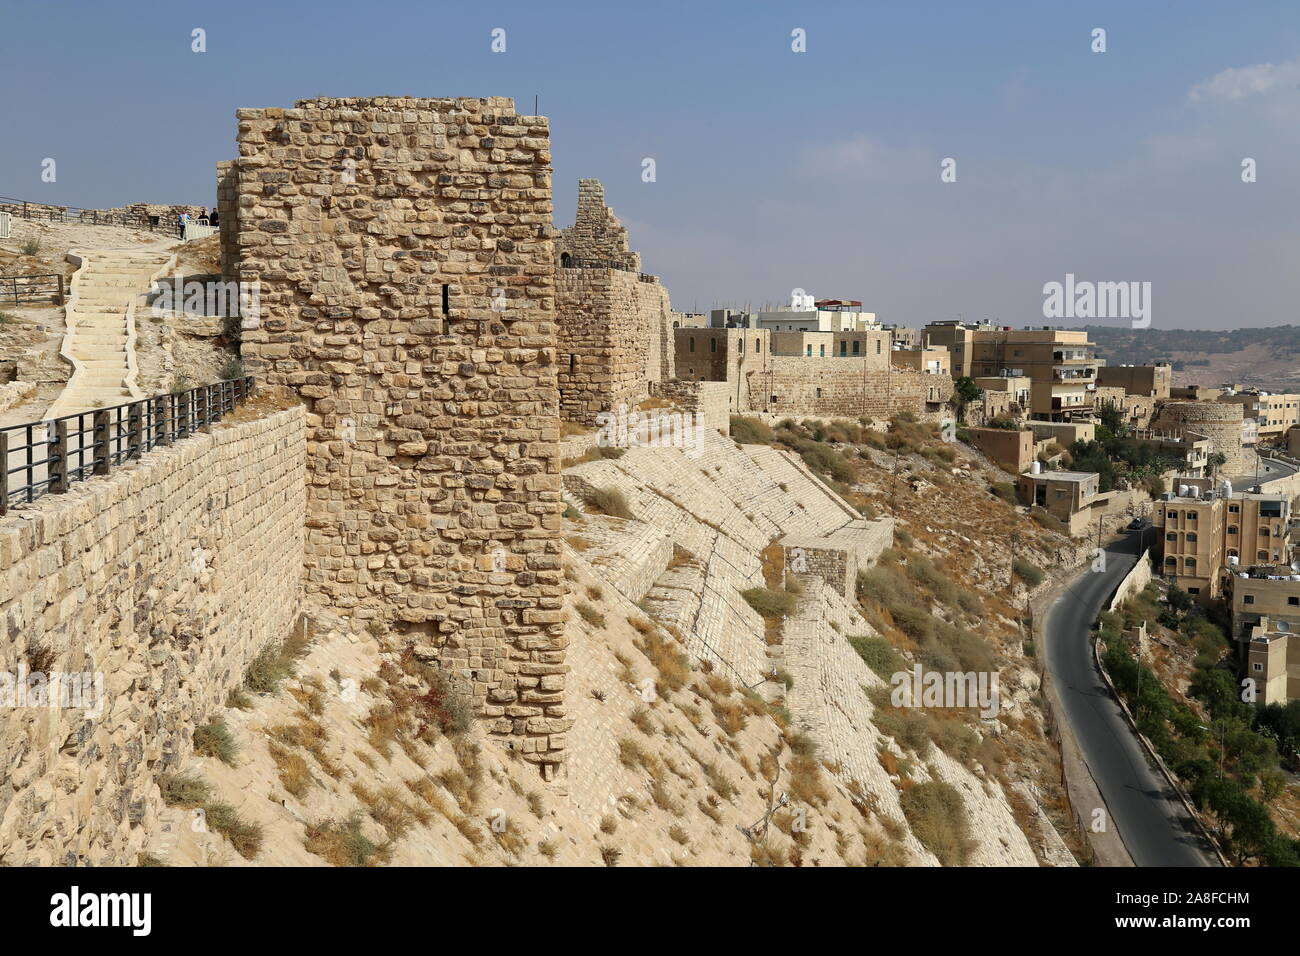 East Wall, Karak Castle, Al Karak, Karak Governorate, Jordan, Middle East Stock Photo